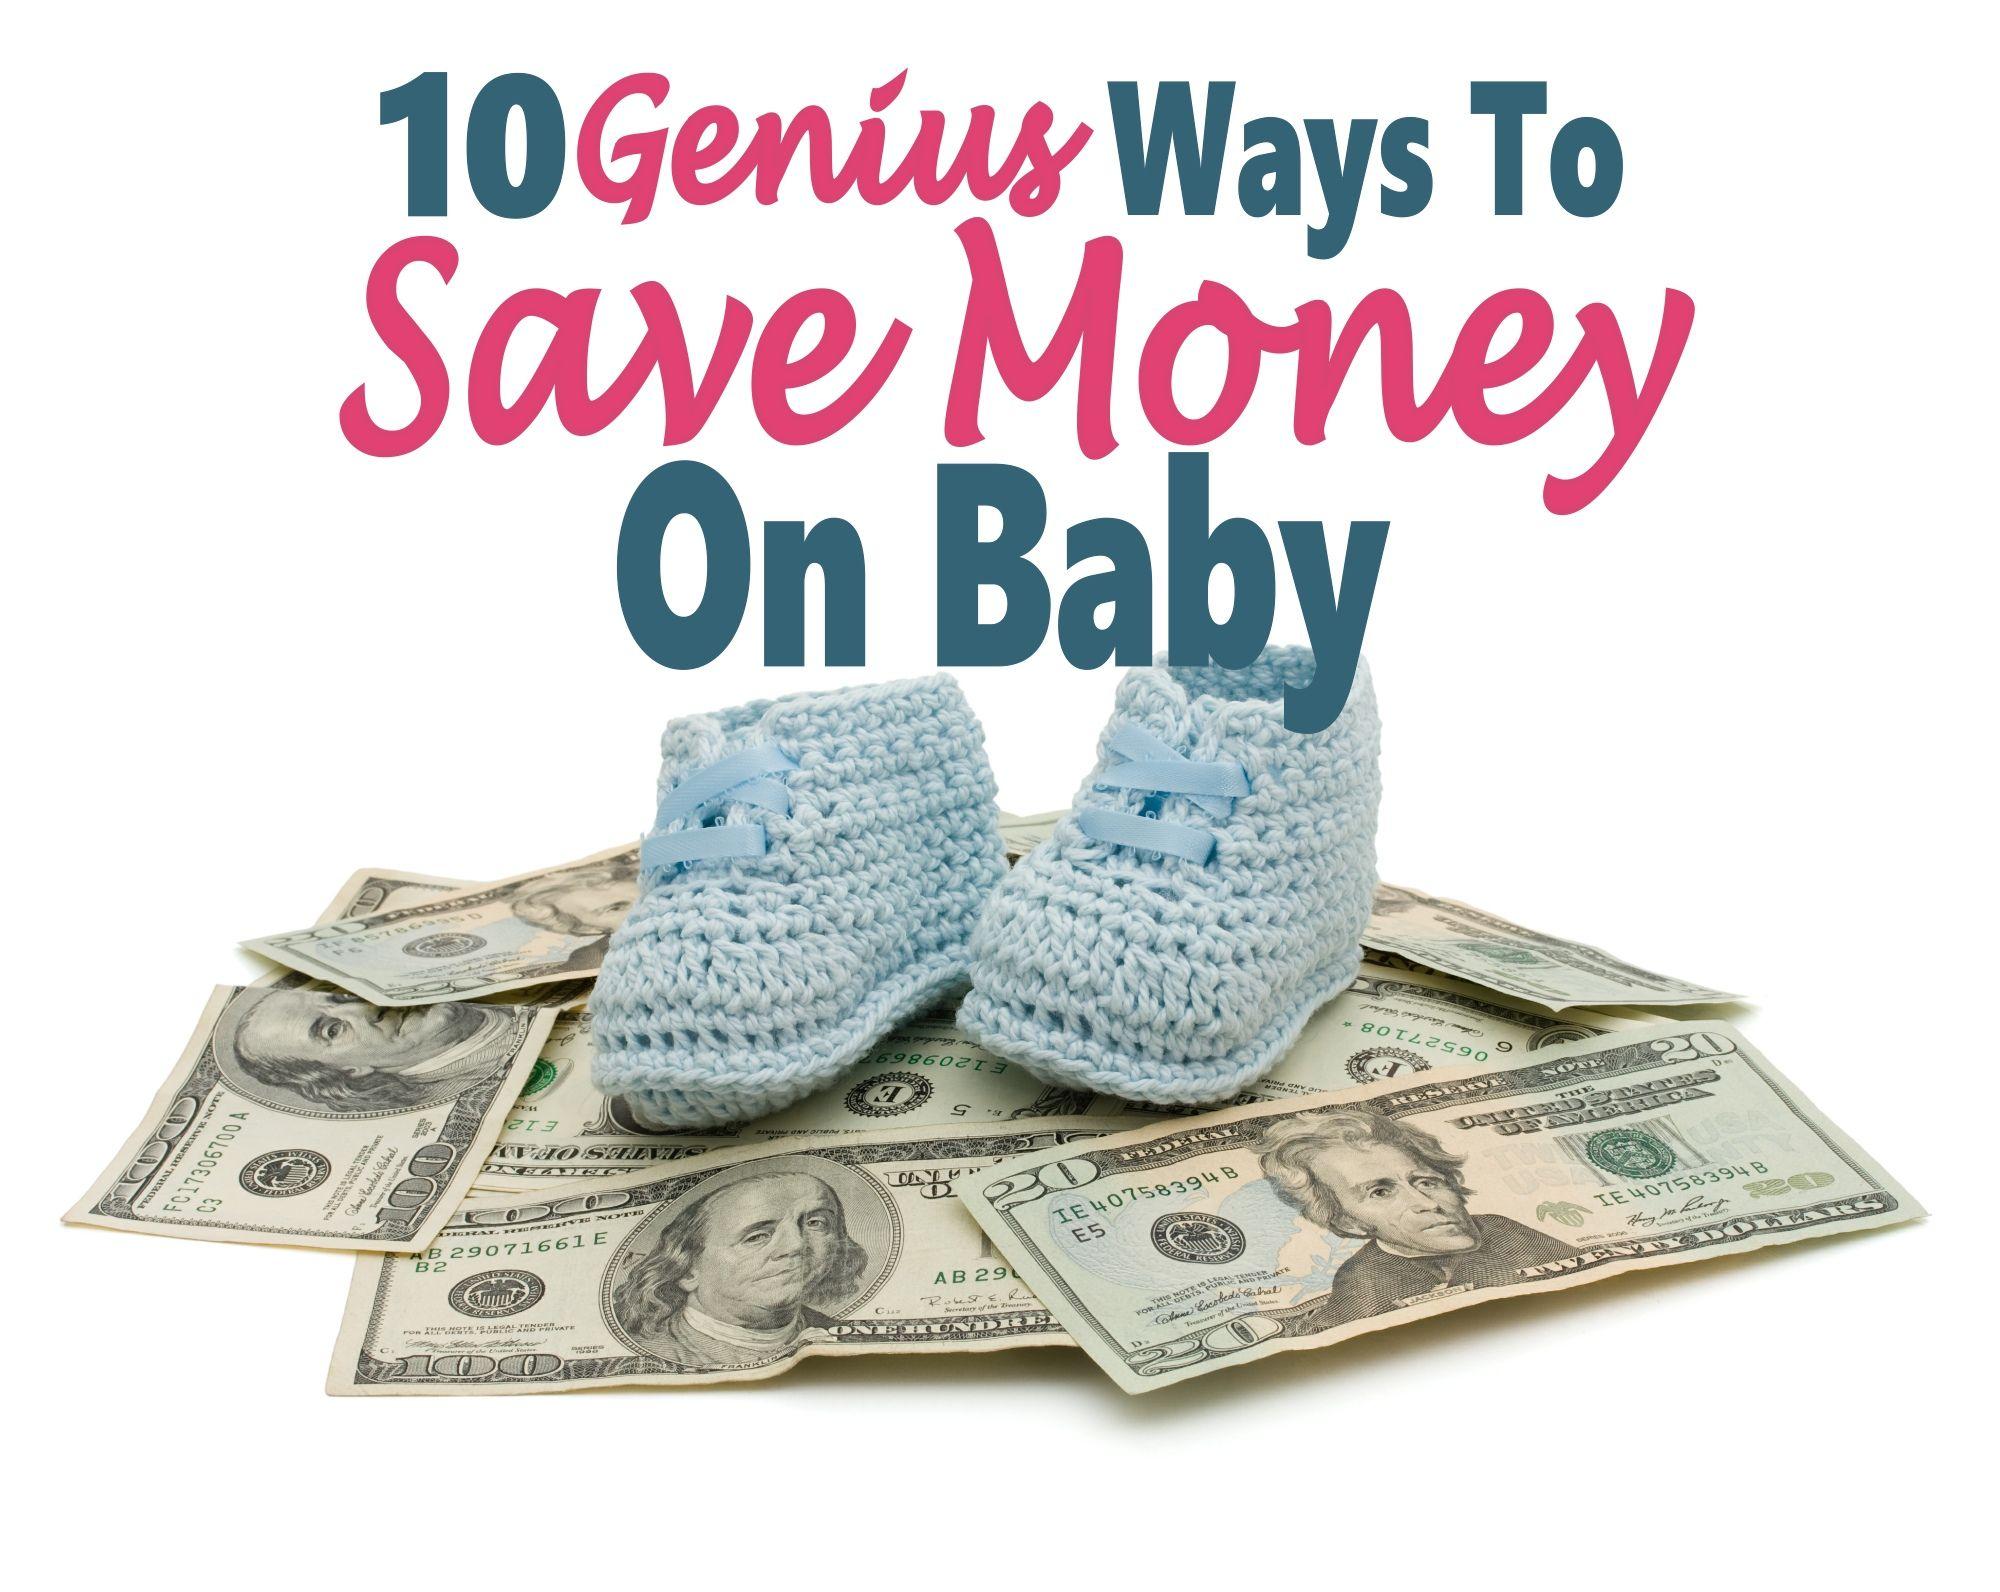 10 Genius Ways To Save Money On Baby